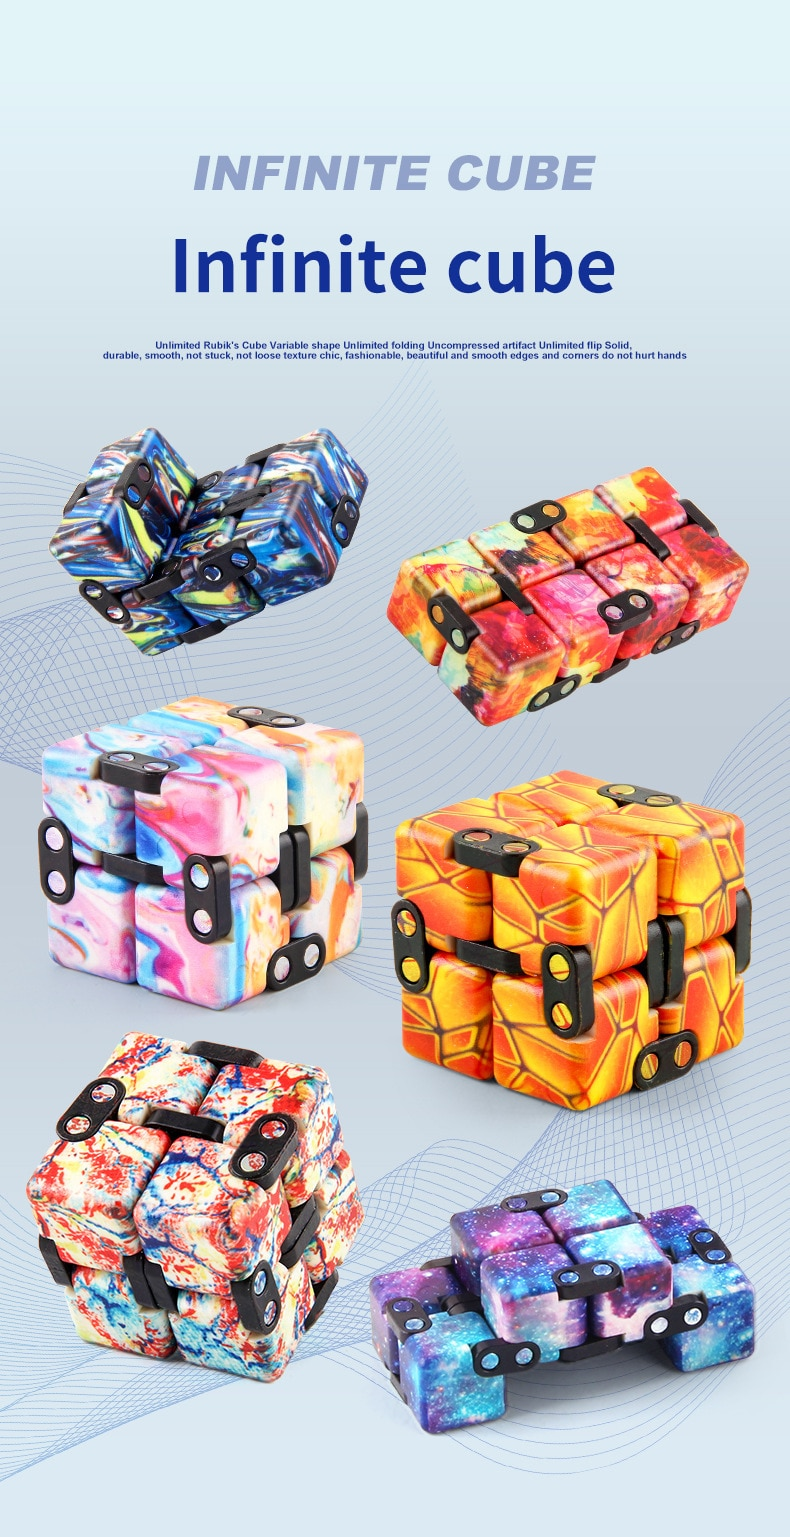 H065136d051e941c1b95f7c44d9313619c - Infinity Cube Fidget